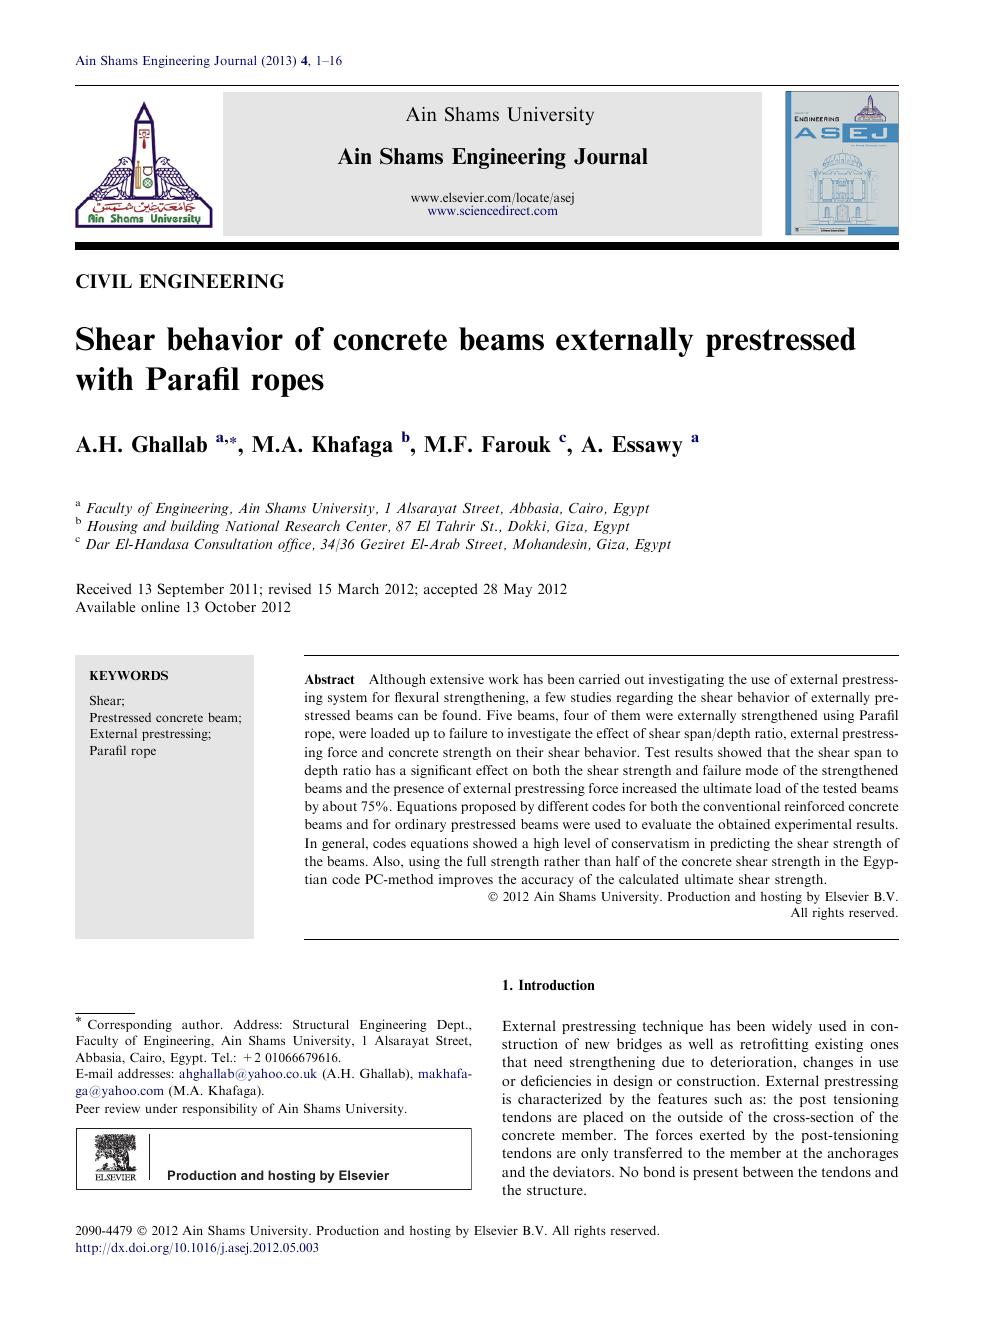 Shear behavior of concrete beams externally prestressed with